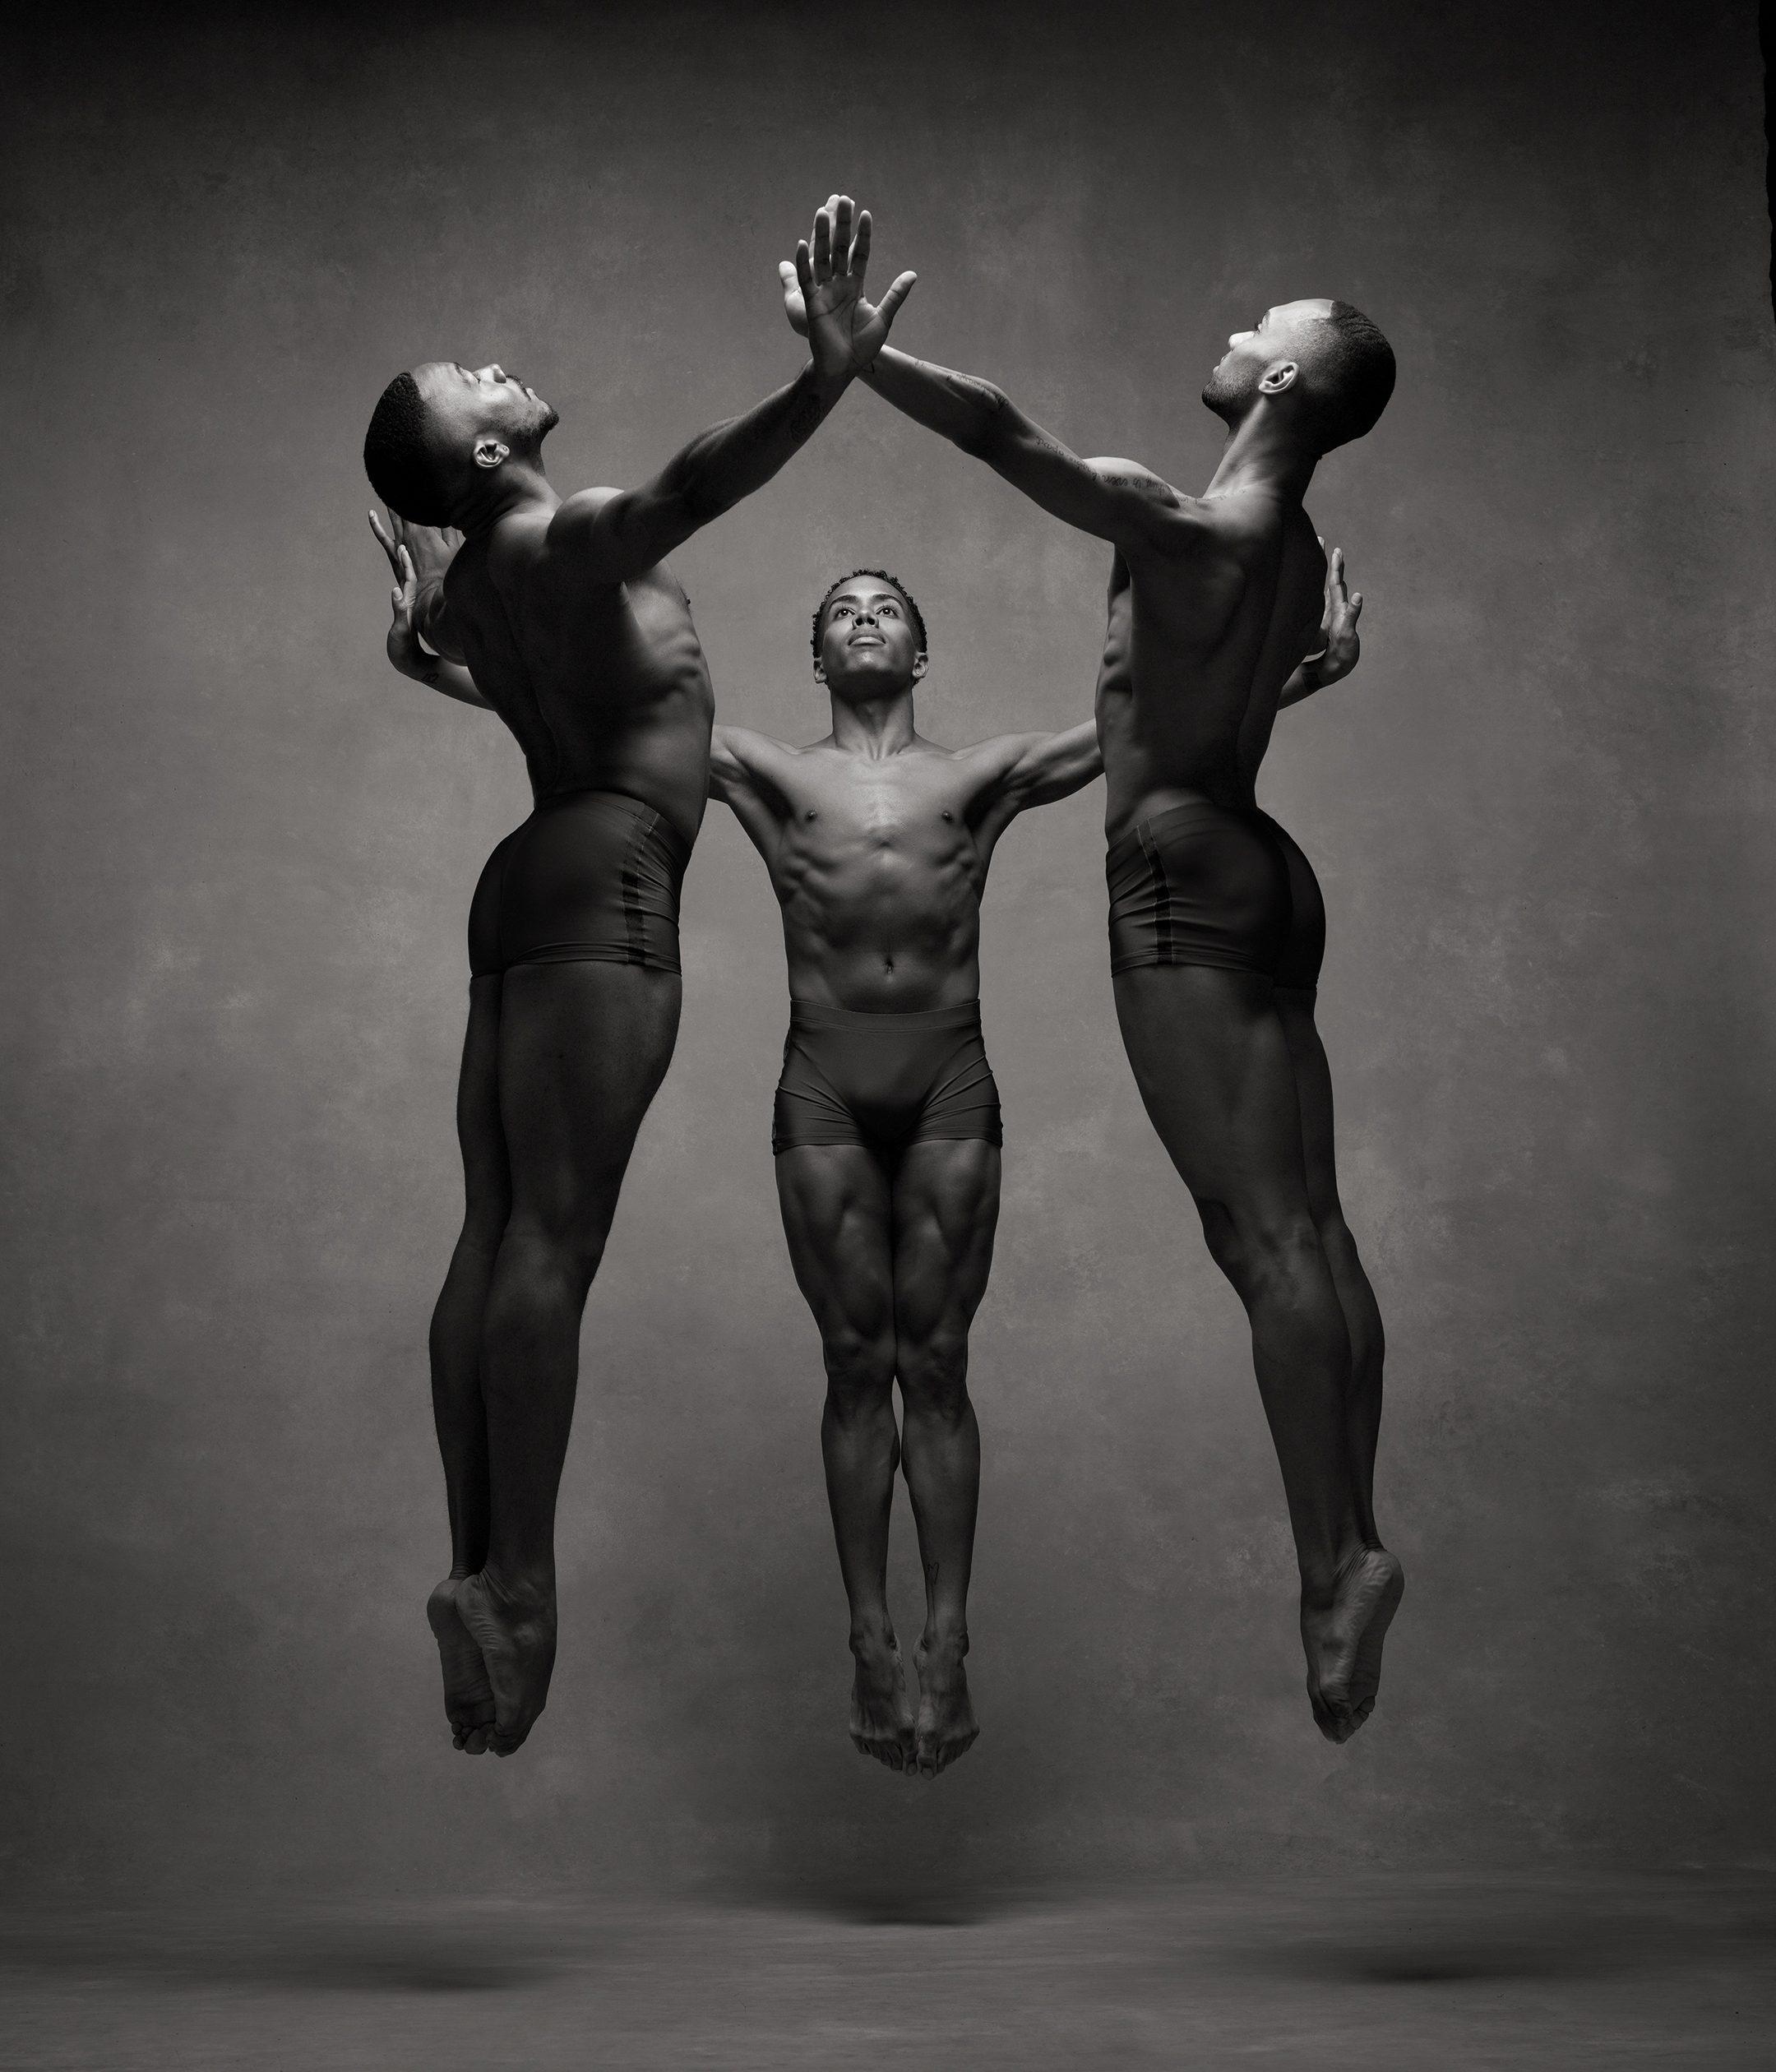 Michael Jackson Jr., Daniel Harder, Sean Aaron Carmon, Alvin Ailey American Dance Theater